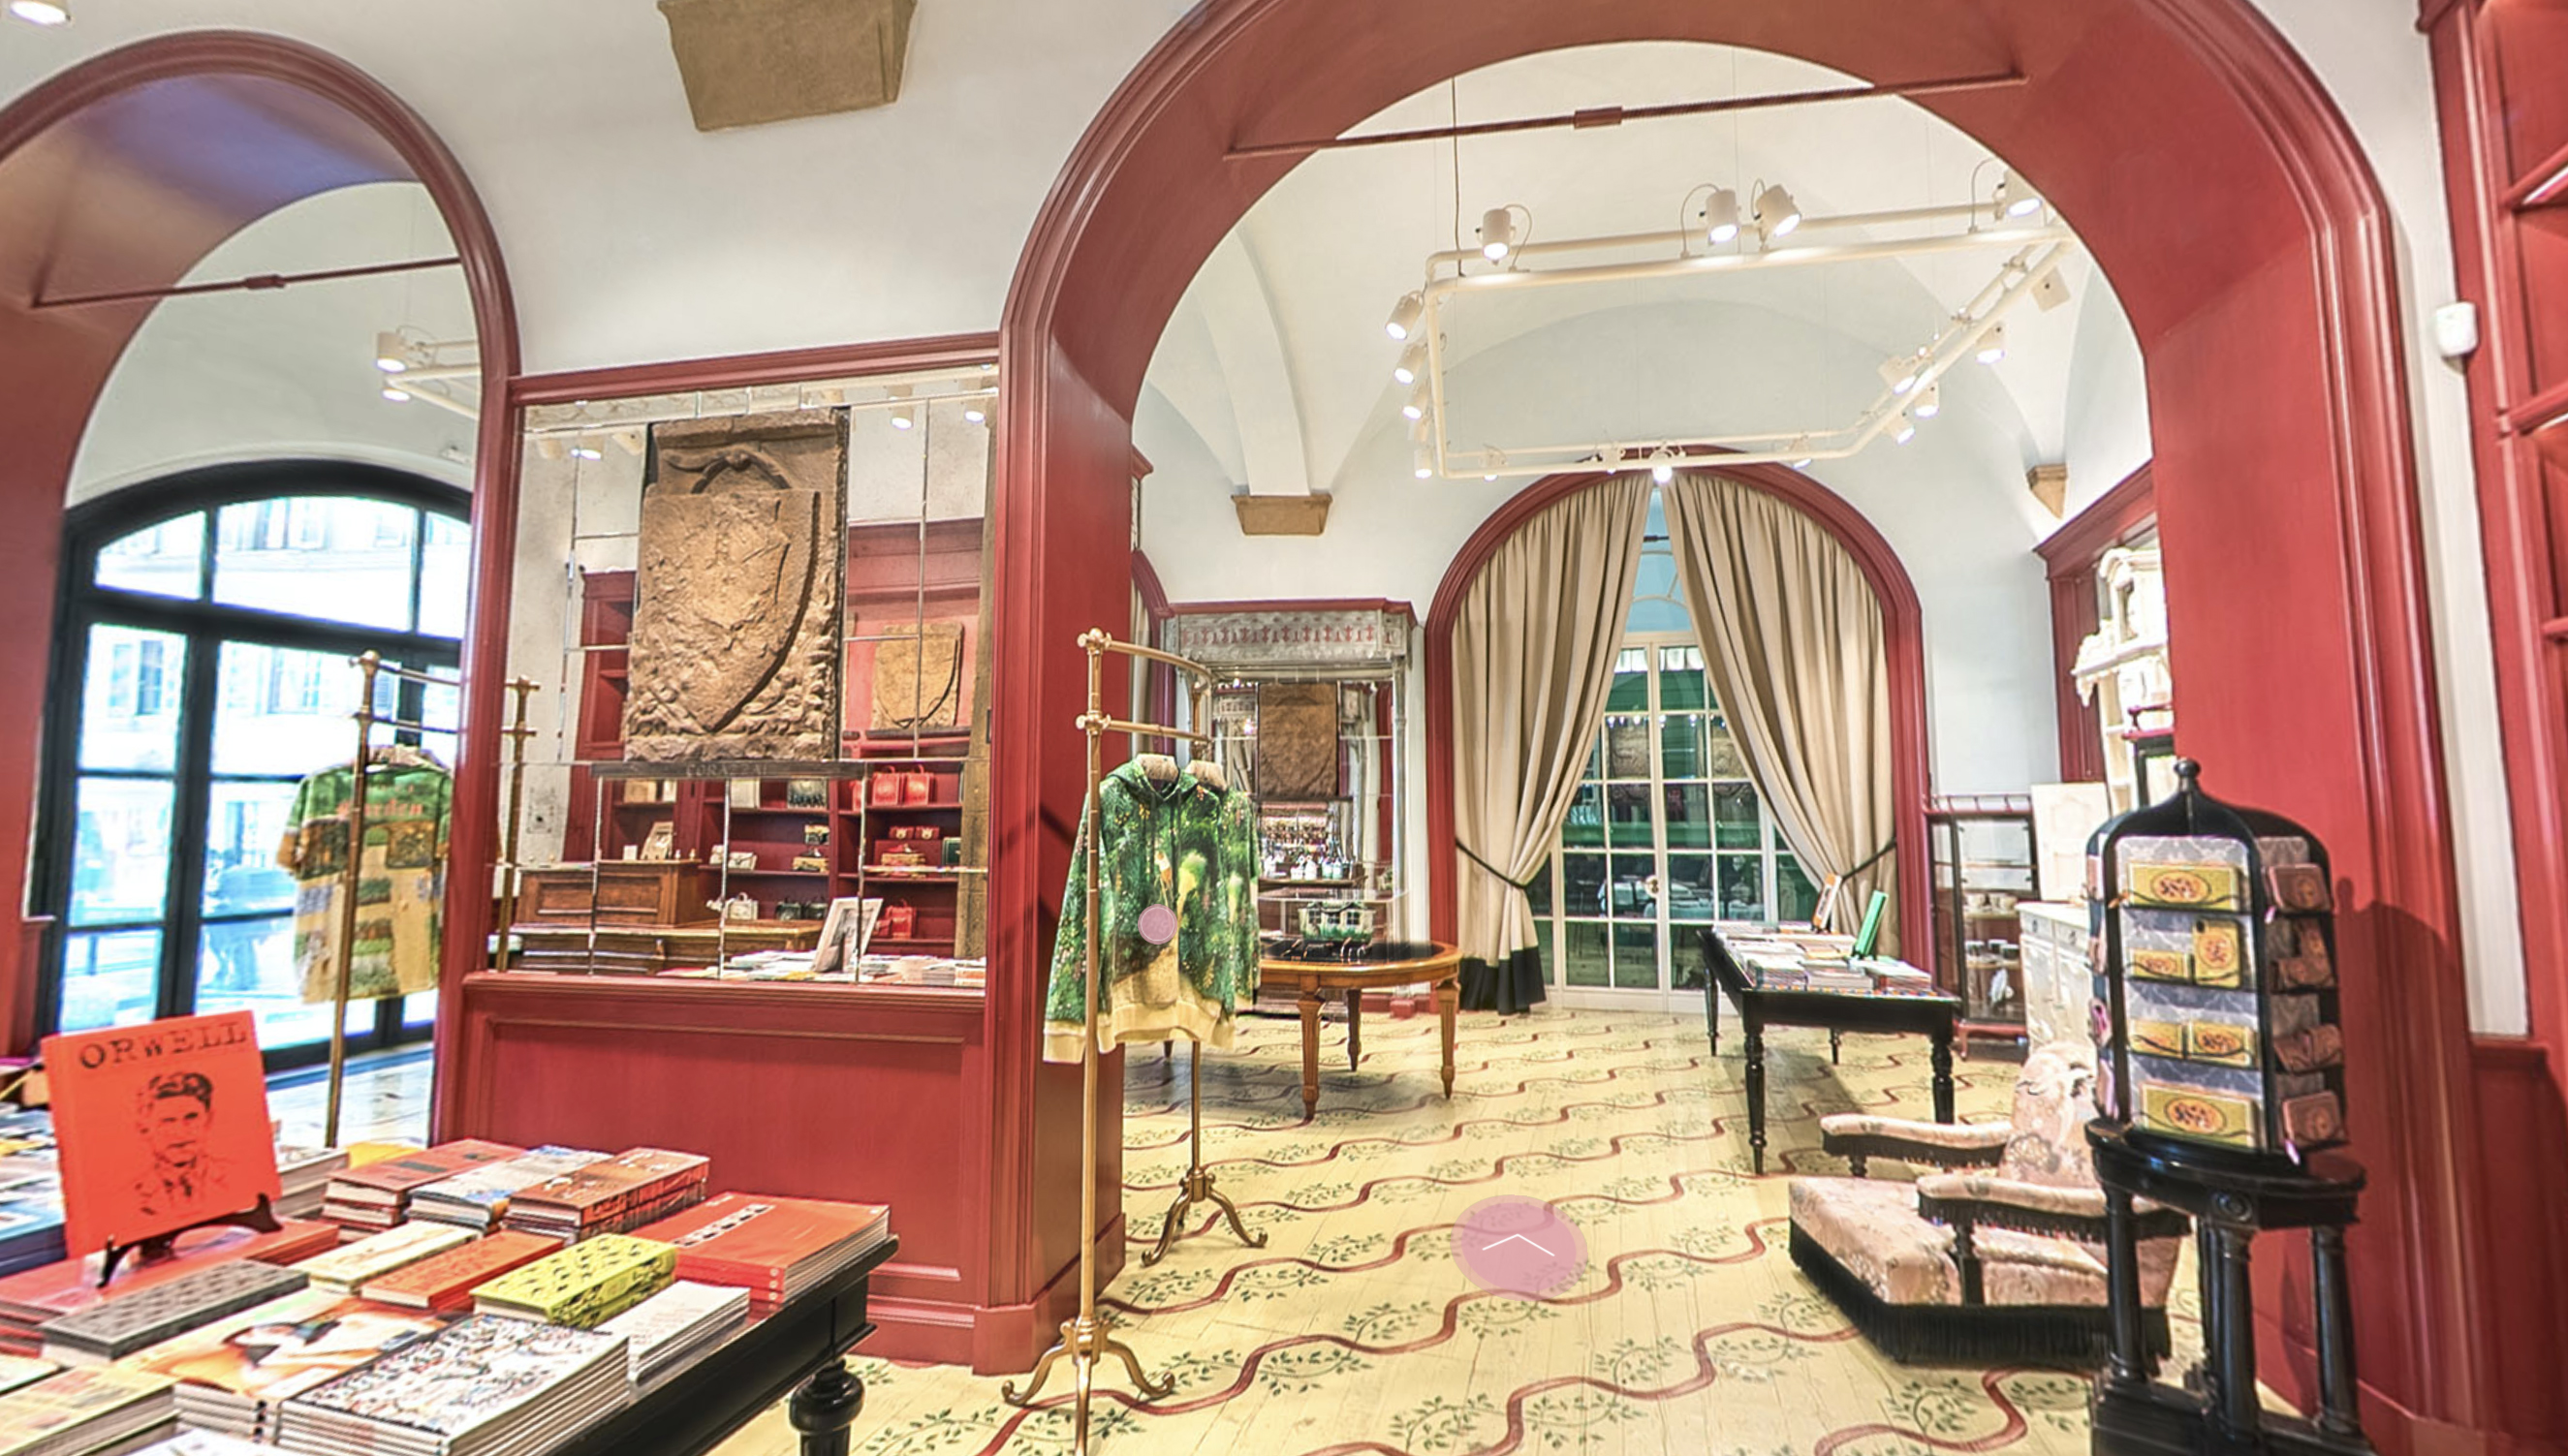 Пространство Gucci Garden расположено во дворце Фиорентине